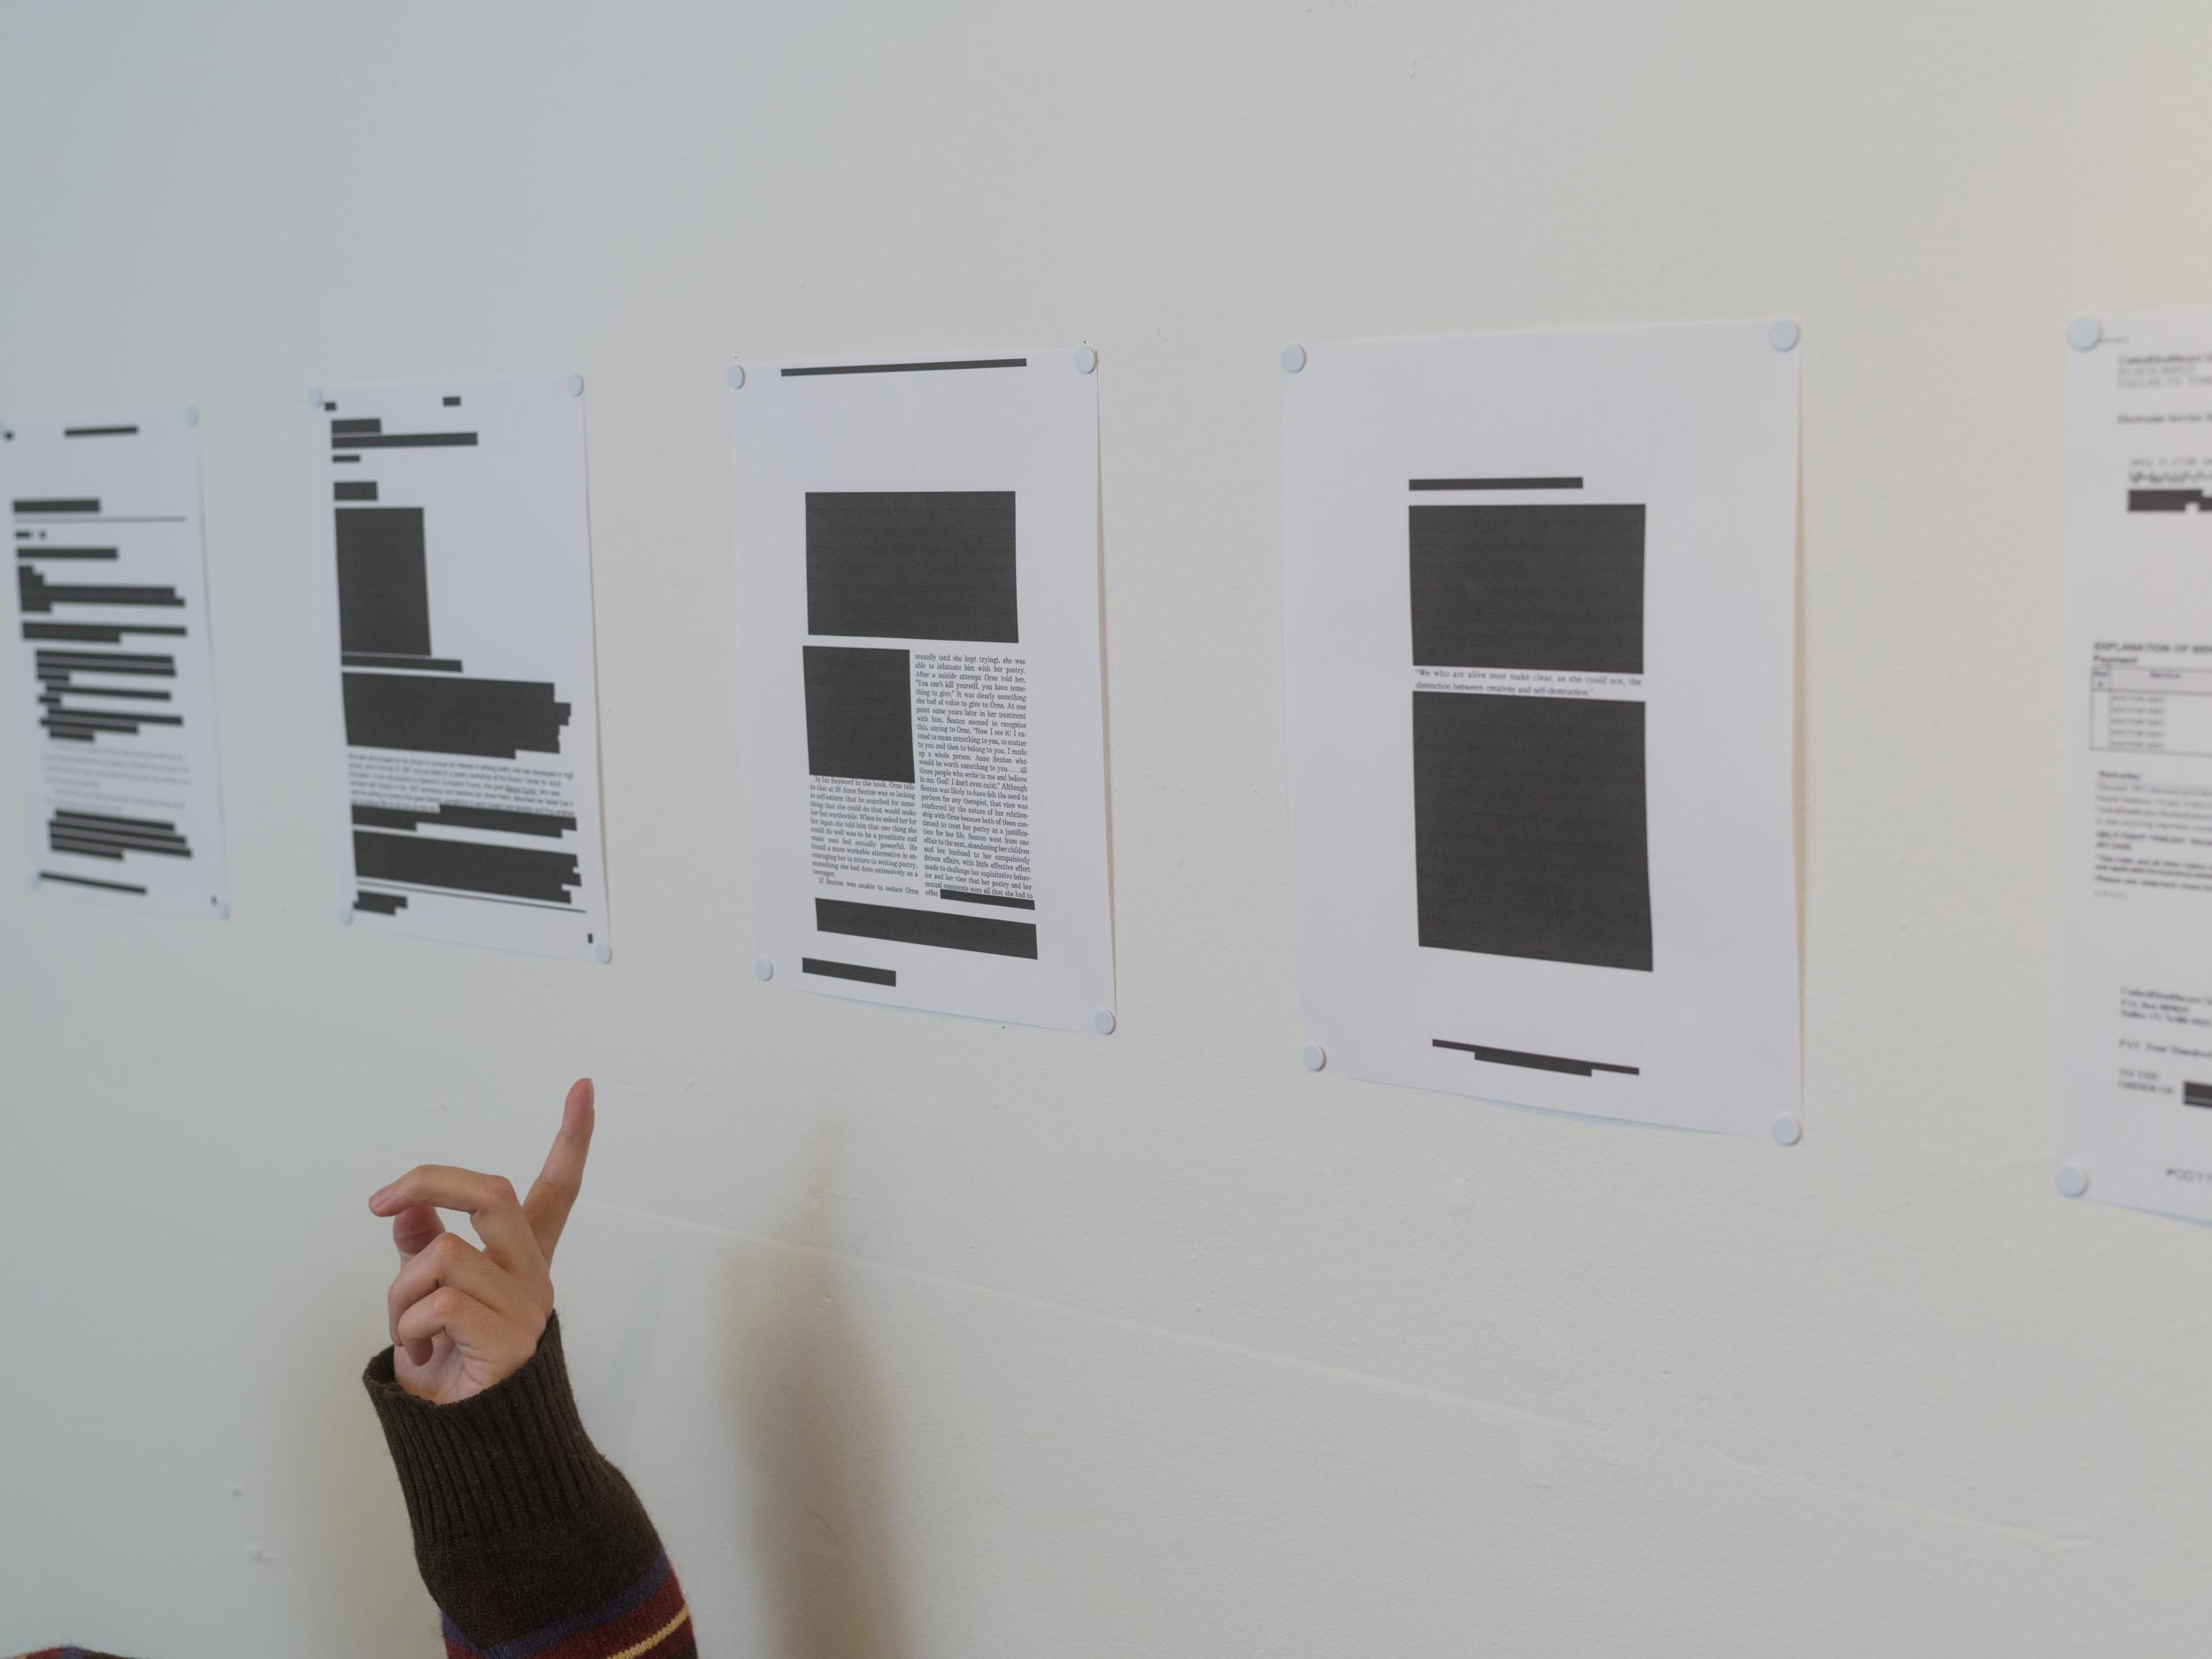 wassaic-project-artist-brandon-sward-2018-12-18-13-12-23.jpg